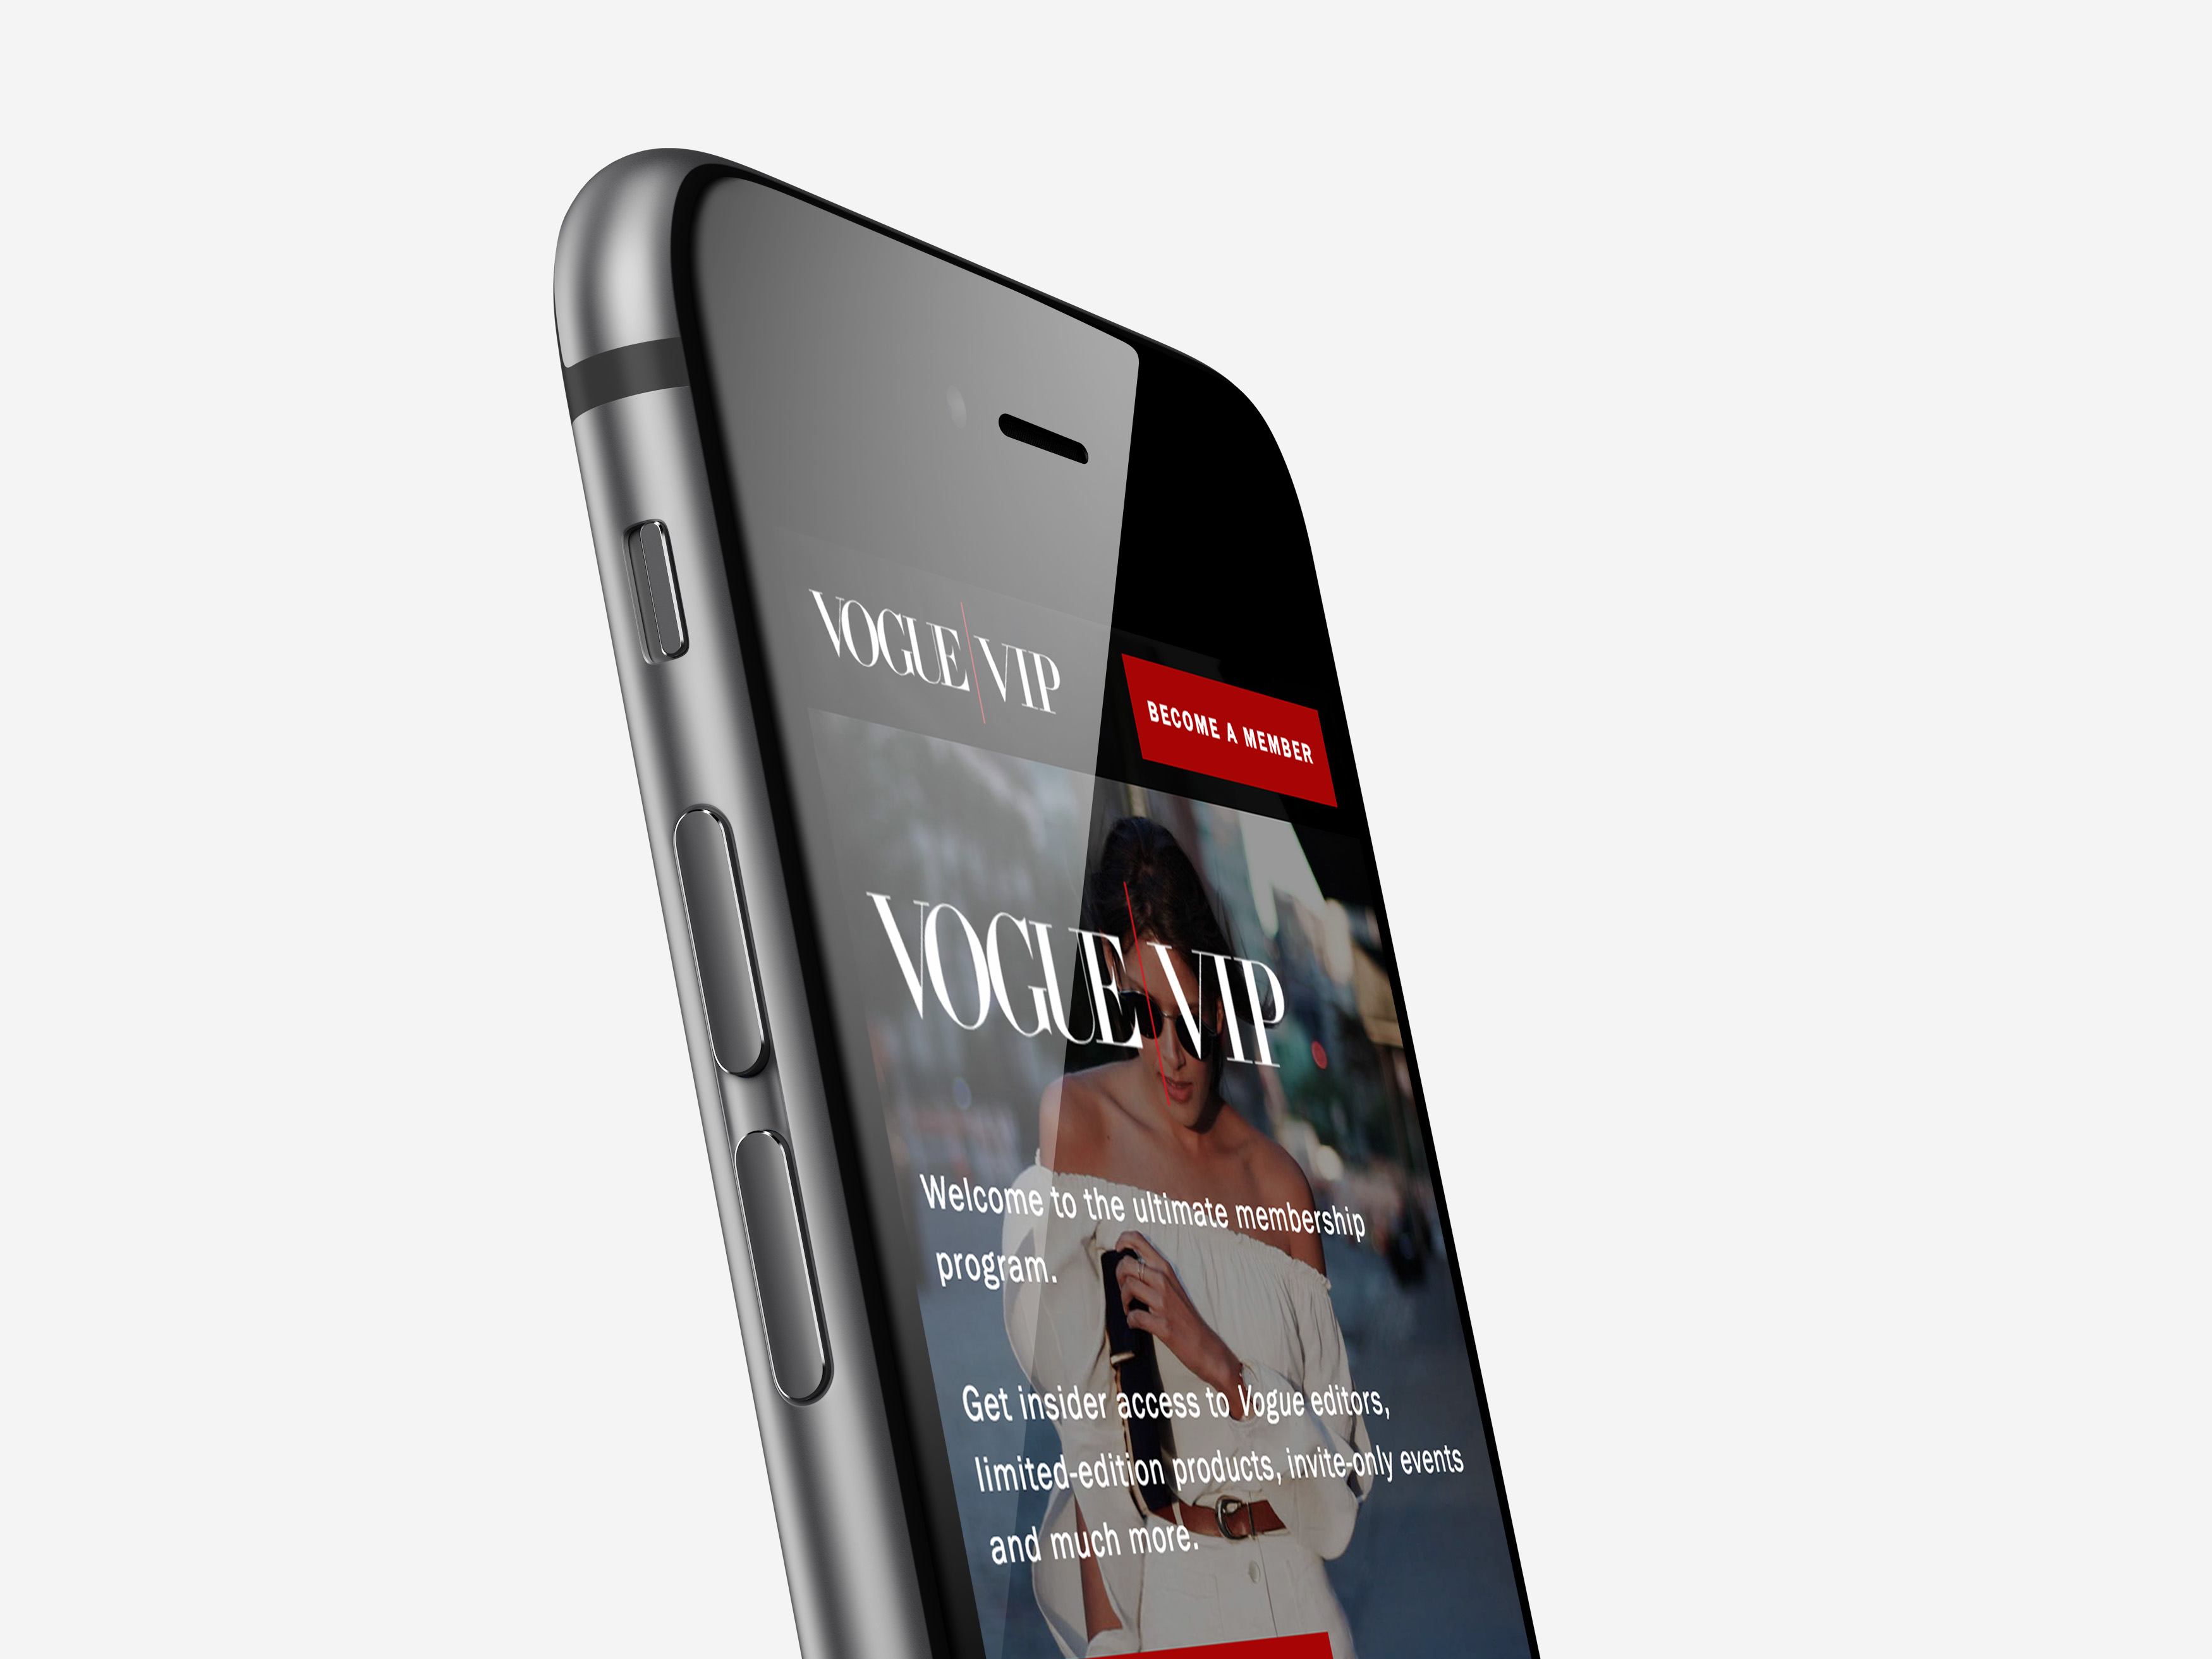 Vogue VIP - Home - Mobile